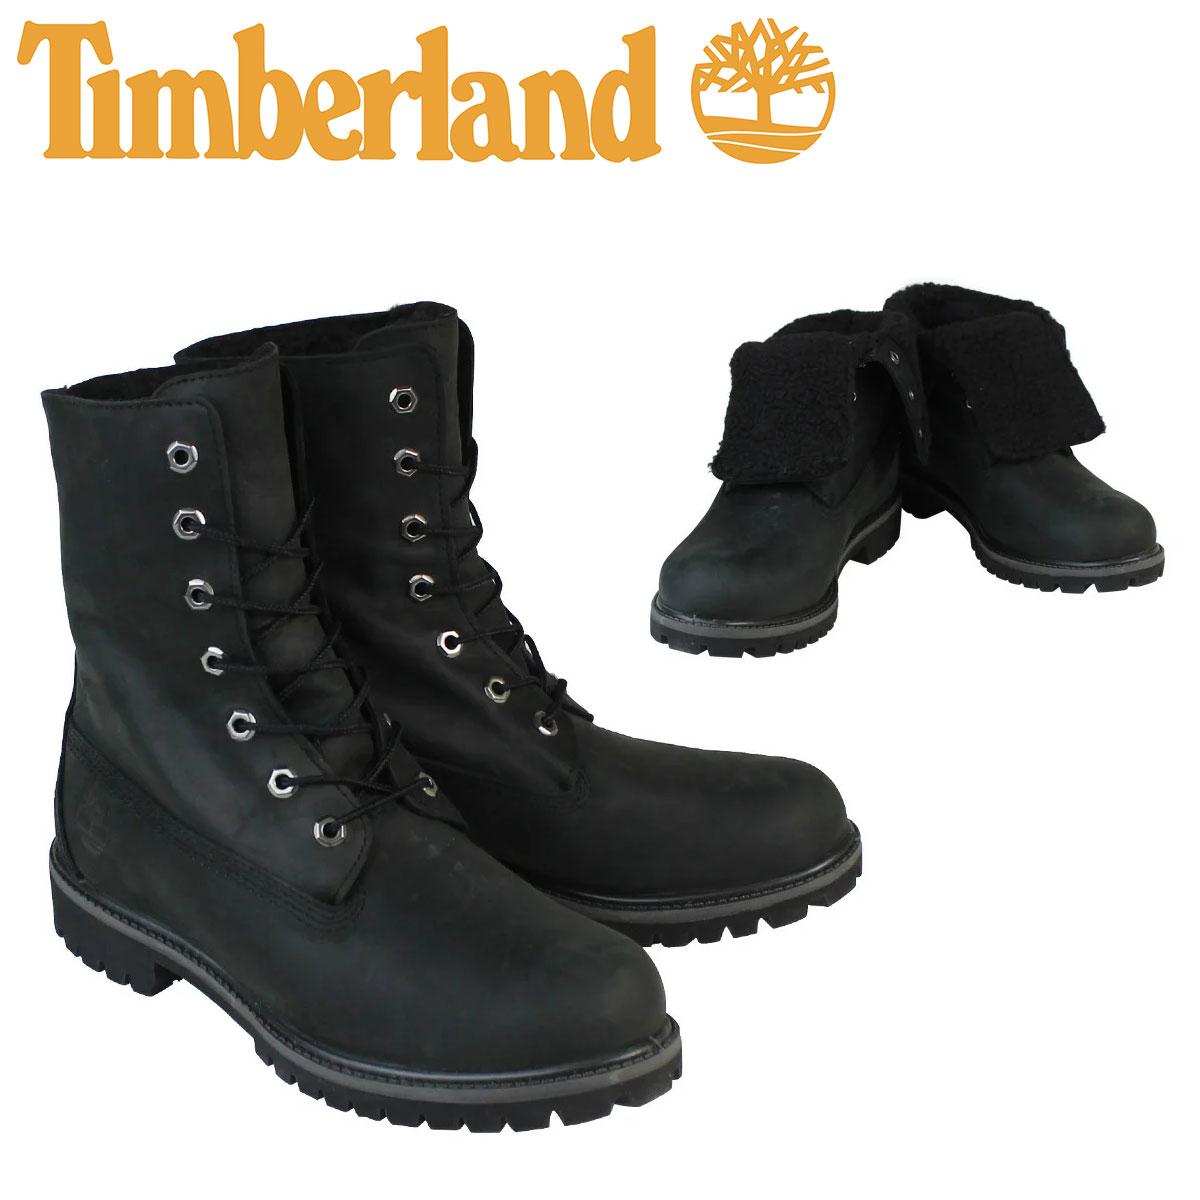 Timberland Bottes - Bas Plier Noir Des Femmes 3hbb9